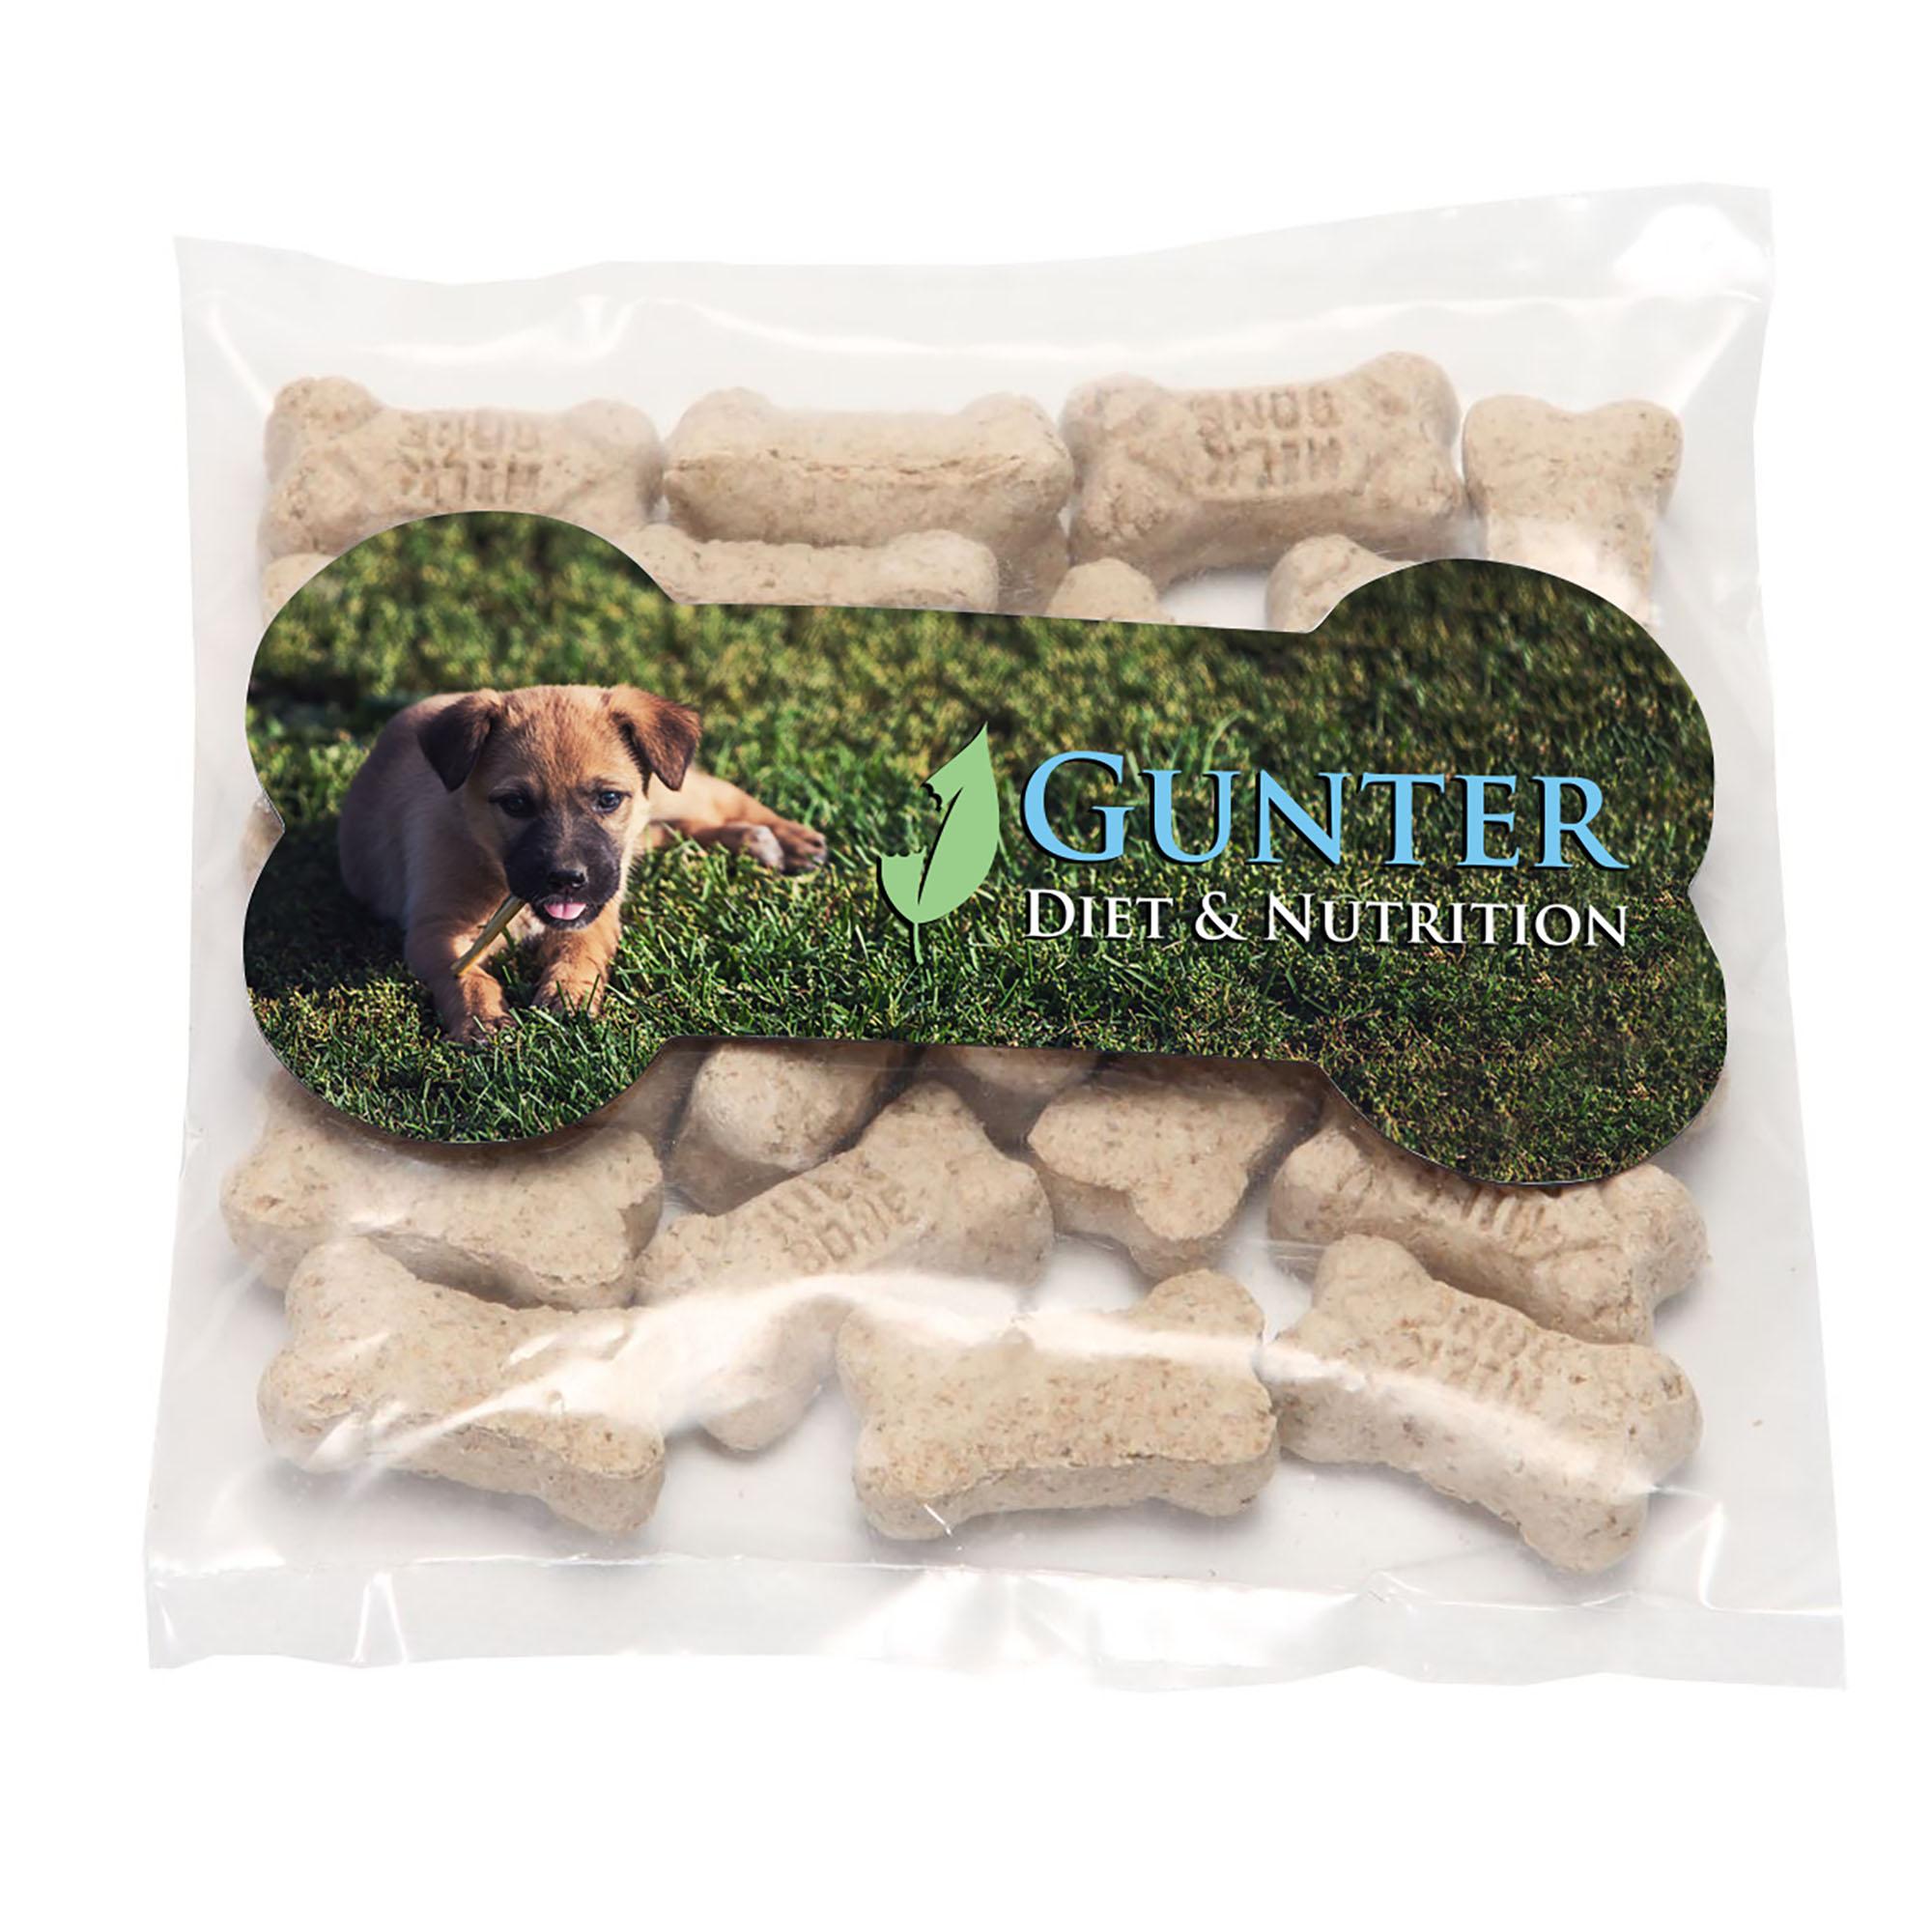 Mini Dog Bones in Bag with Bone Magnet